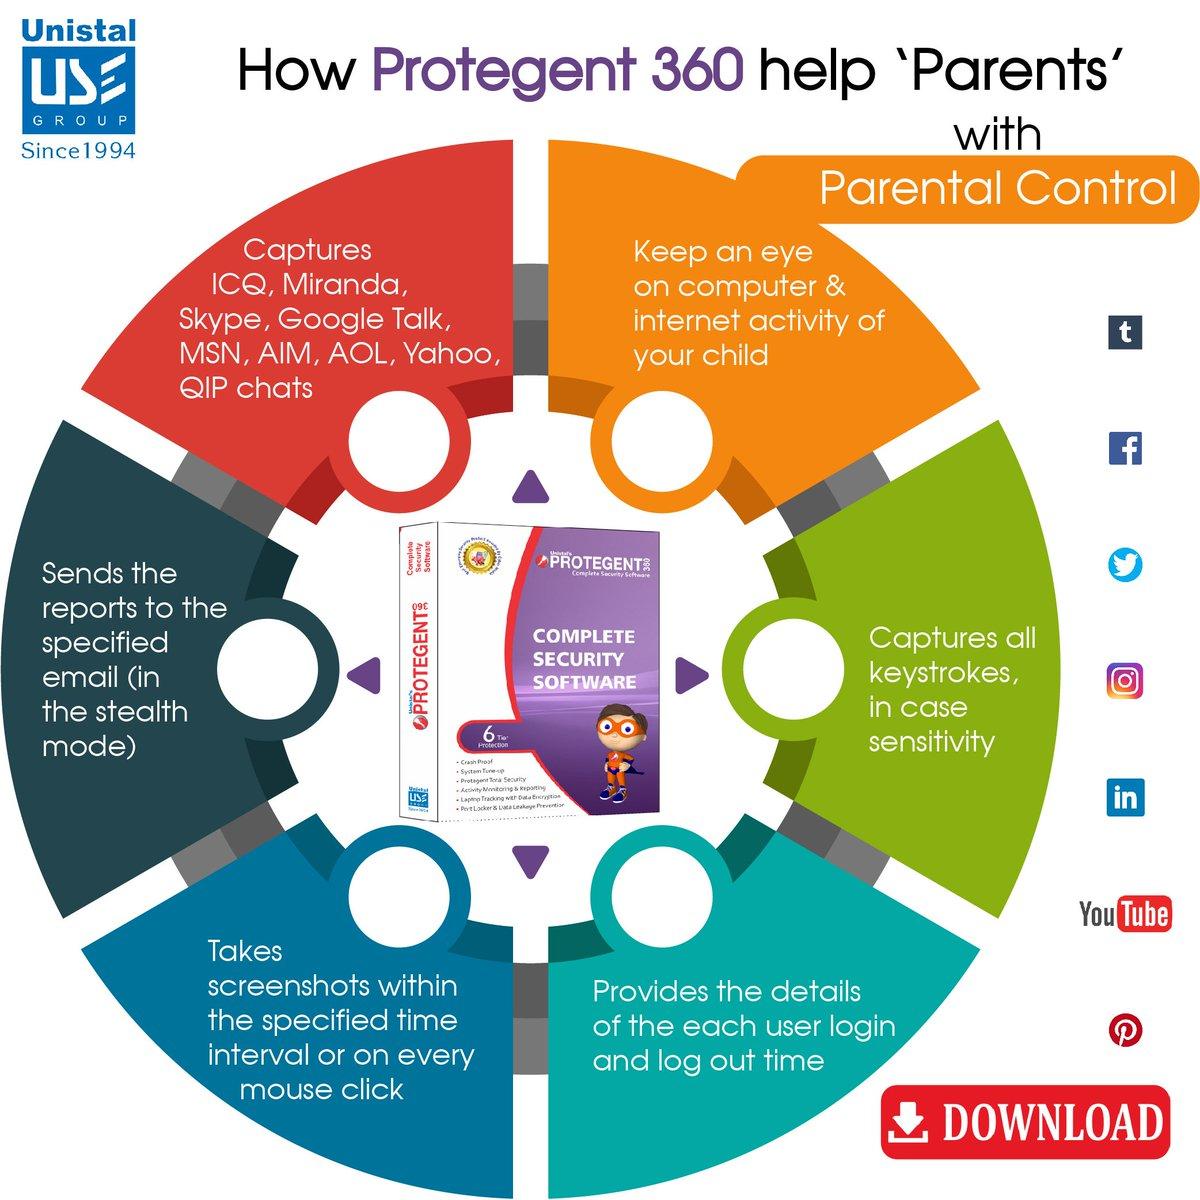 protegent360 hashtag on Twitter